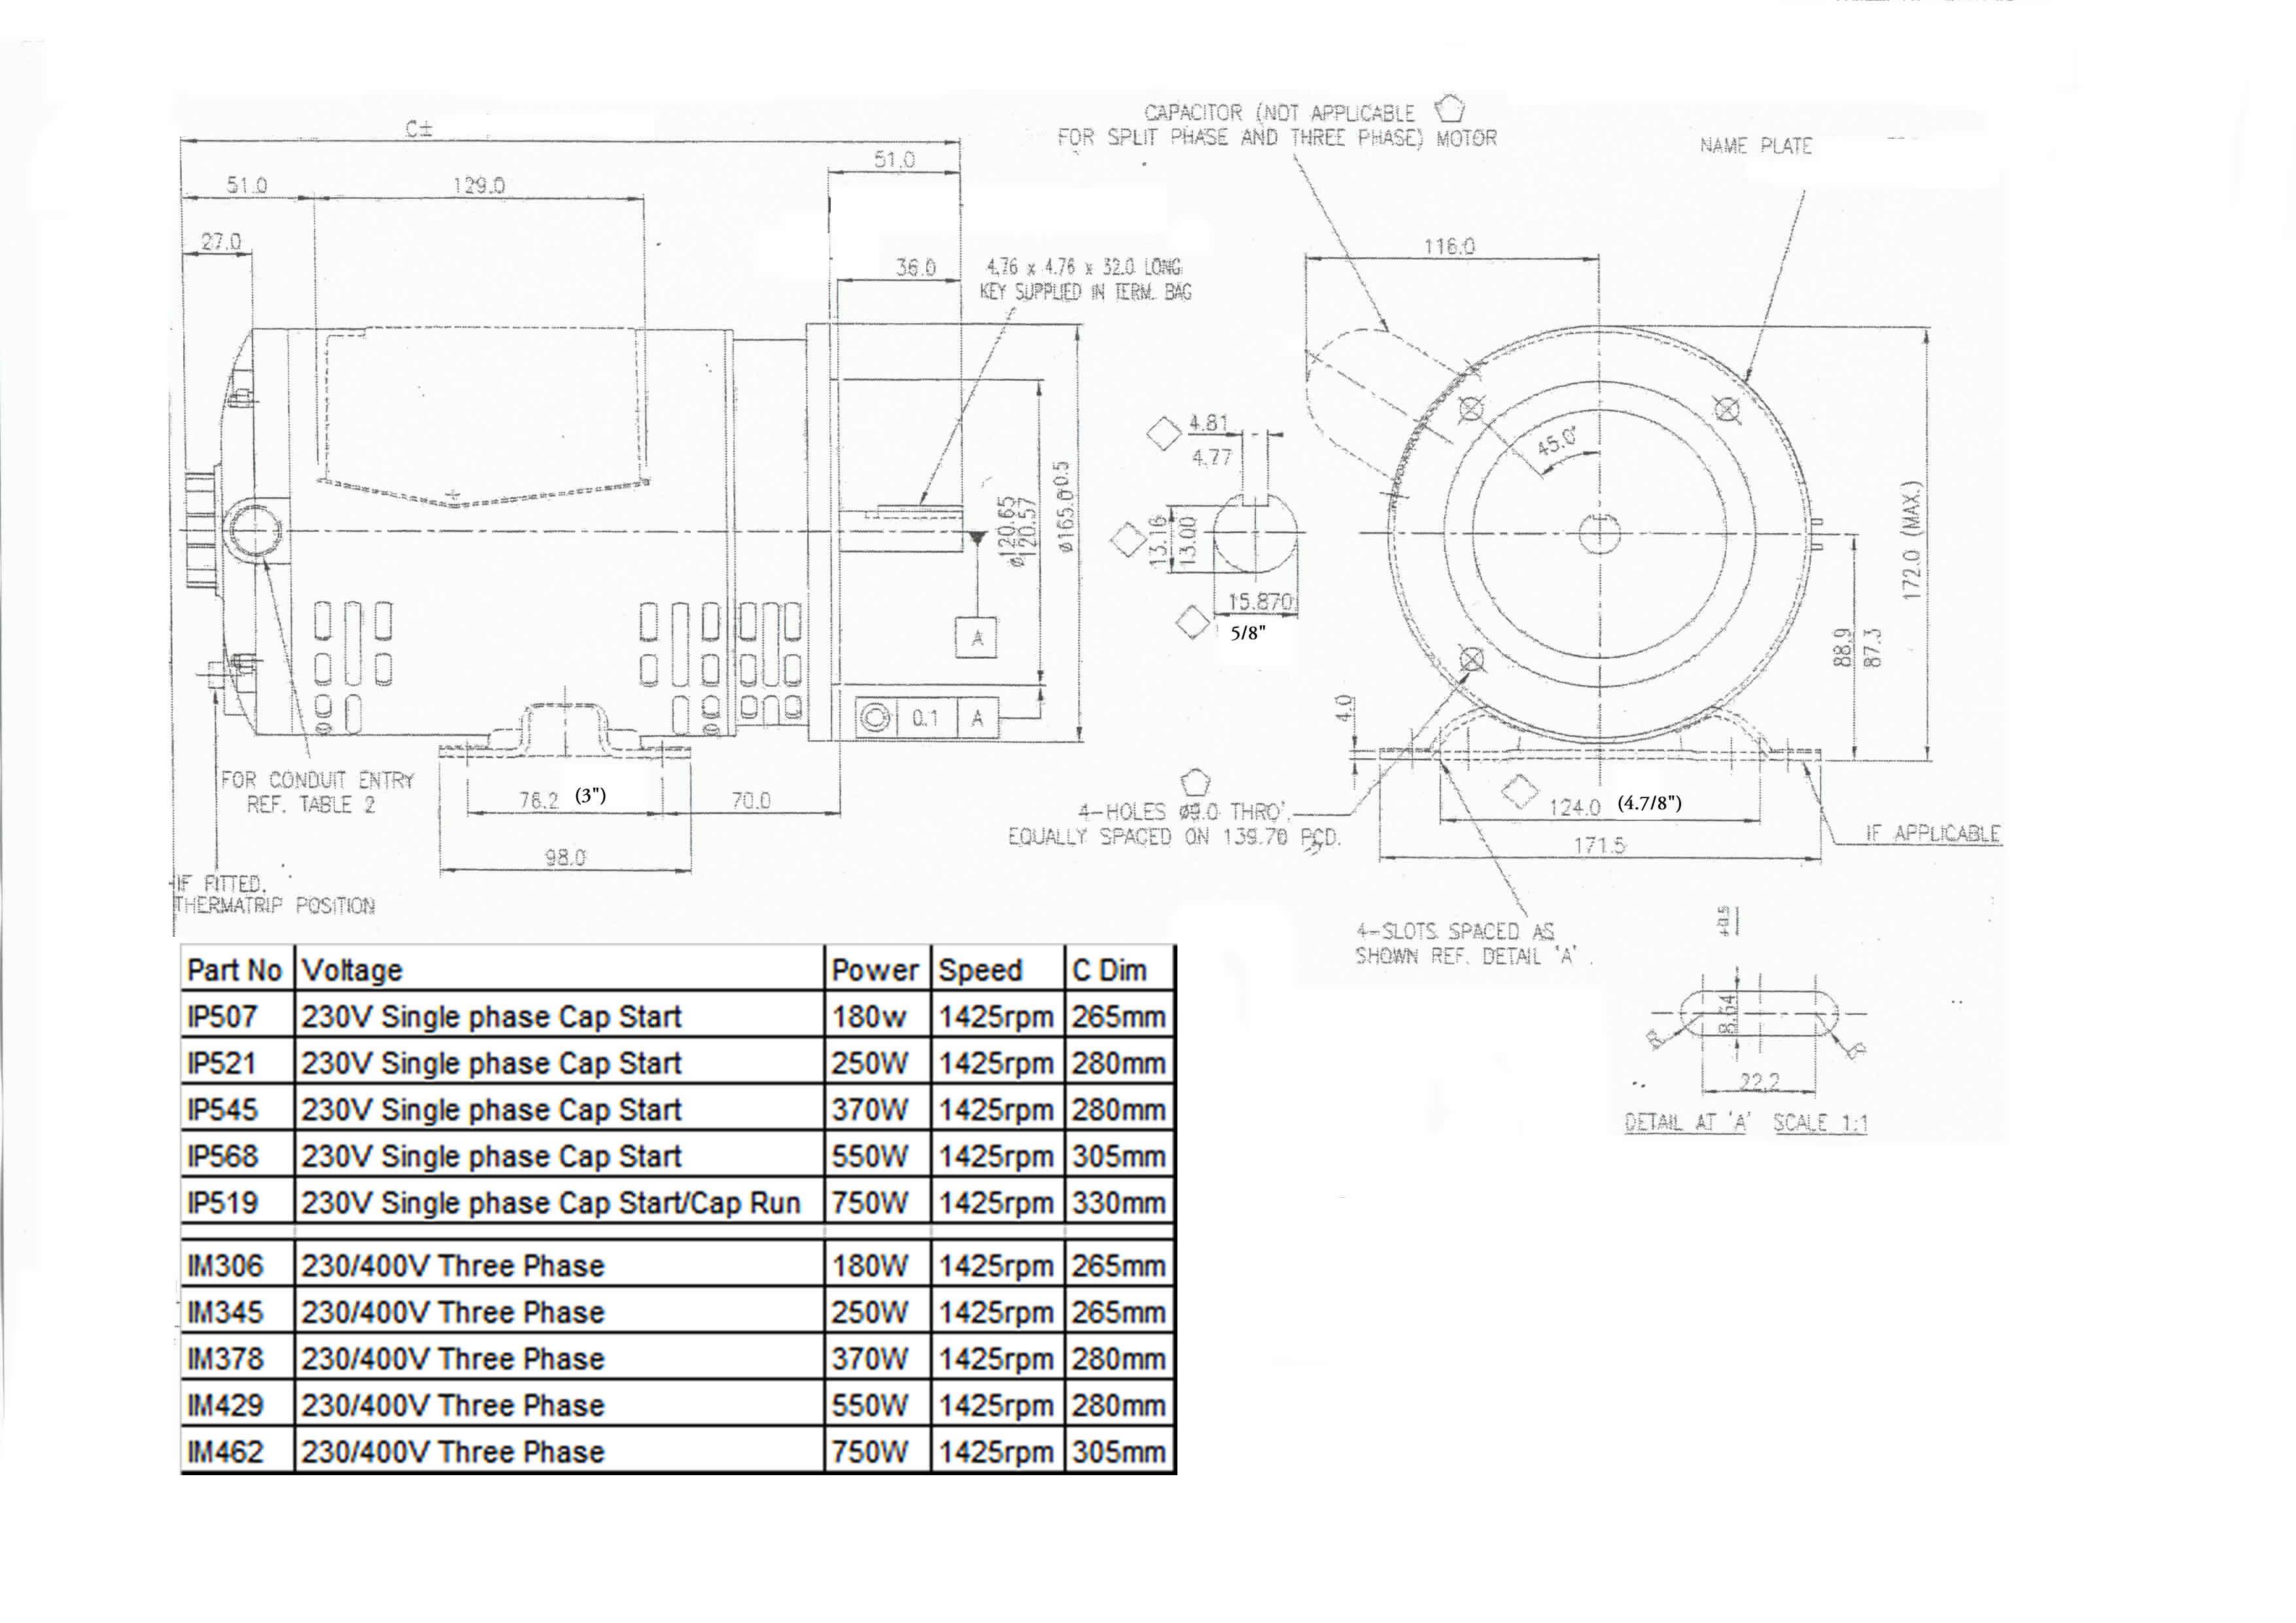 Vem Motor Wiring Diagram : Vem motor wiring diagram vm